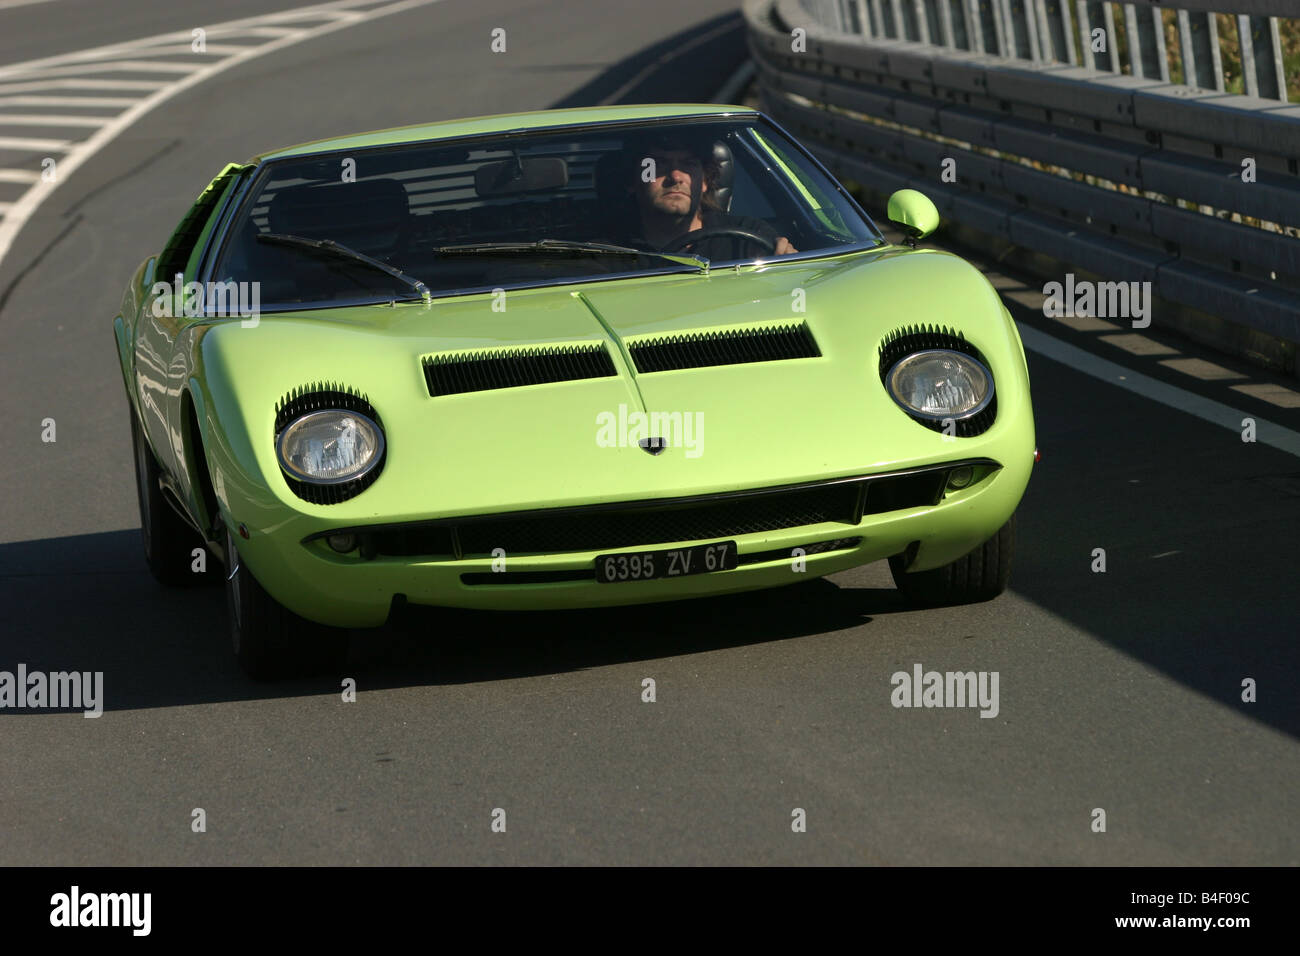 Car Lamborghini Miura P 400 S Vintage Car Green Sports Car